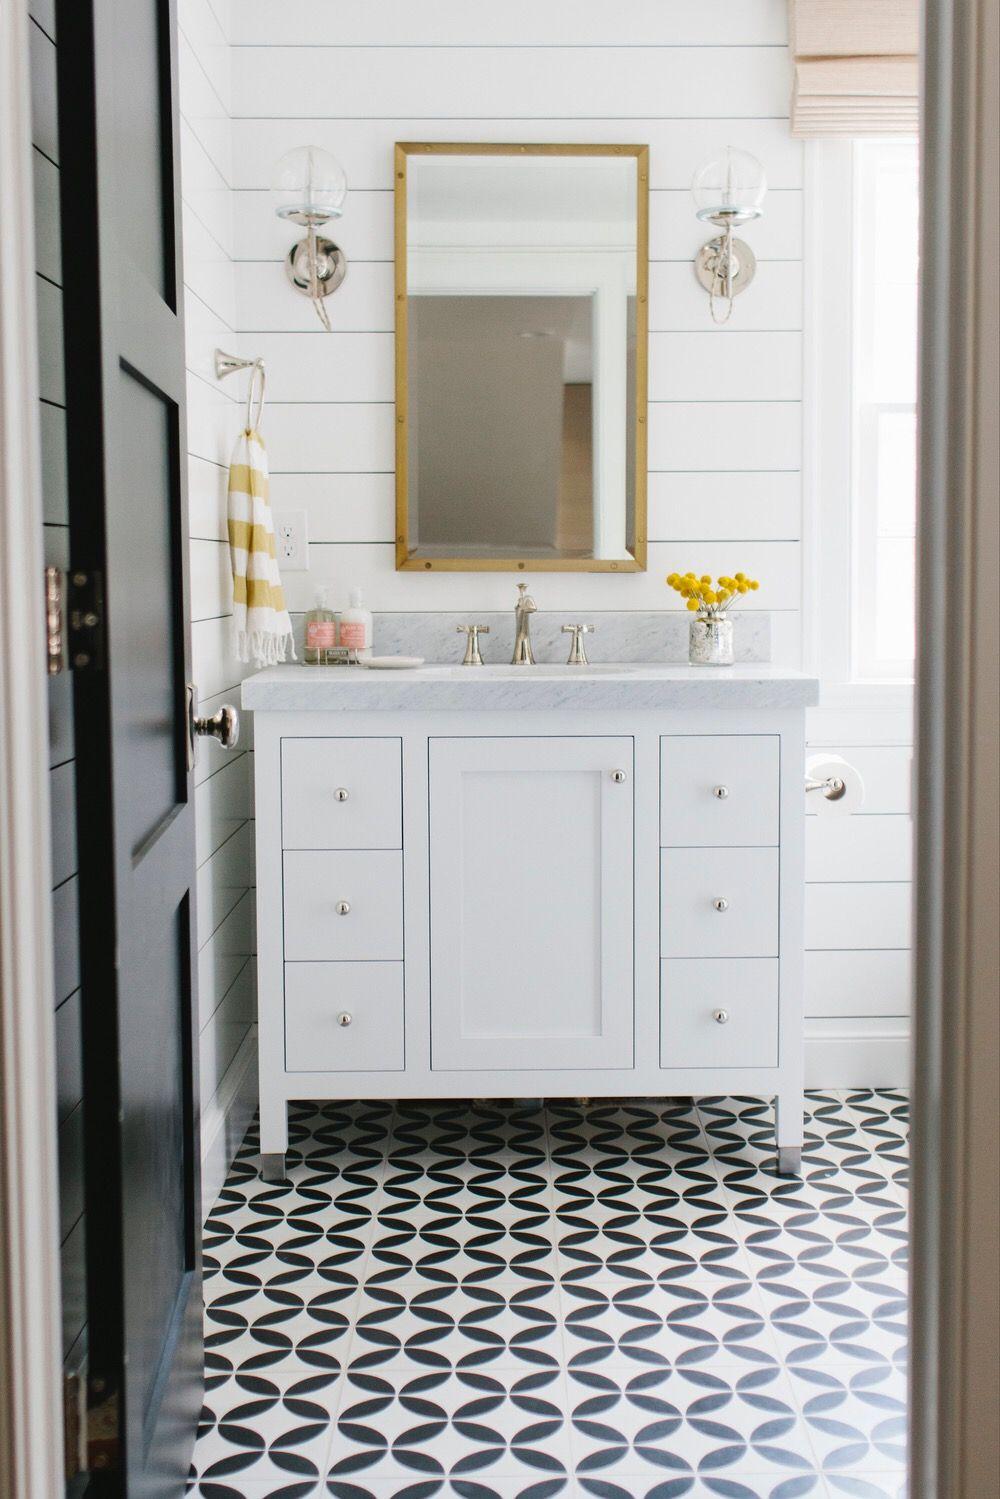 Pin by Jessica Warren on DIY inspirations. | Pinterest | Bathroom ...